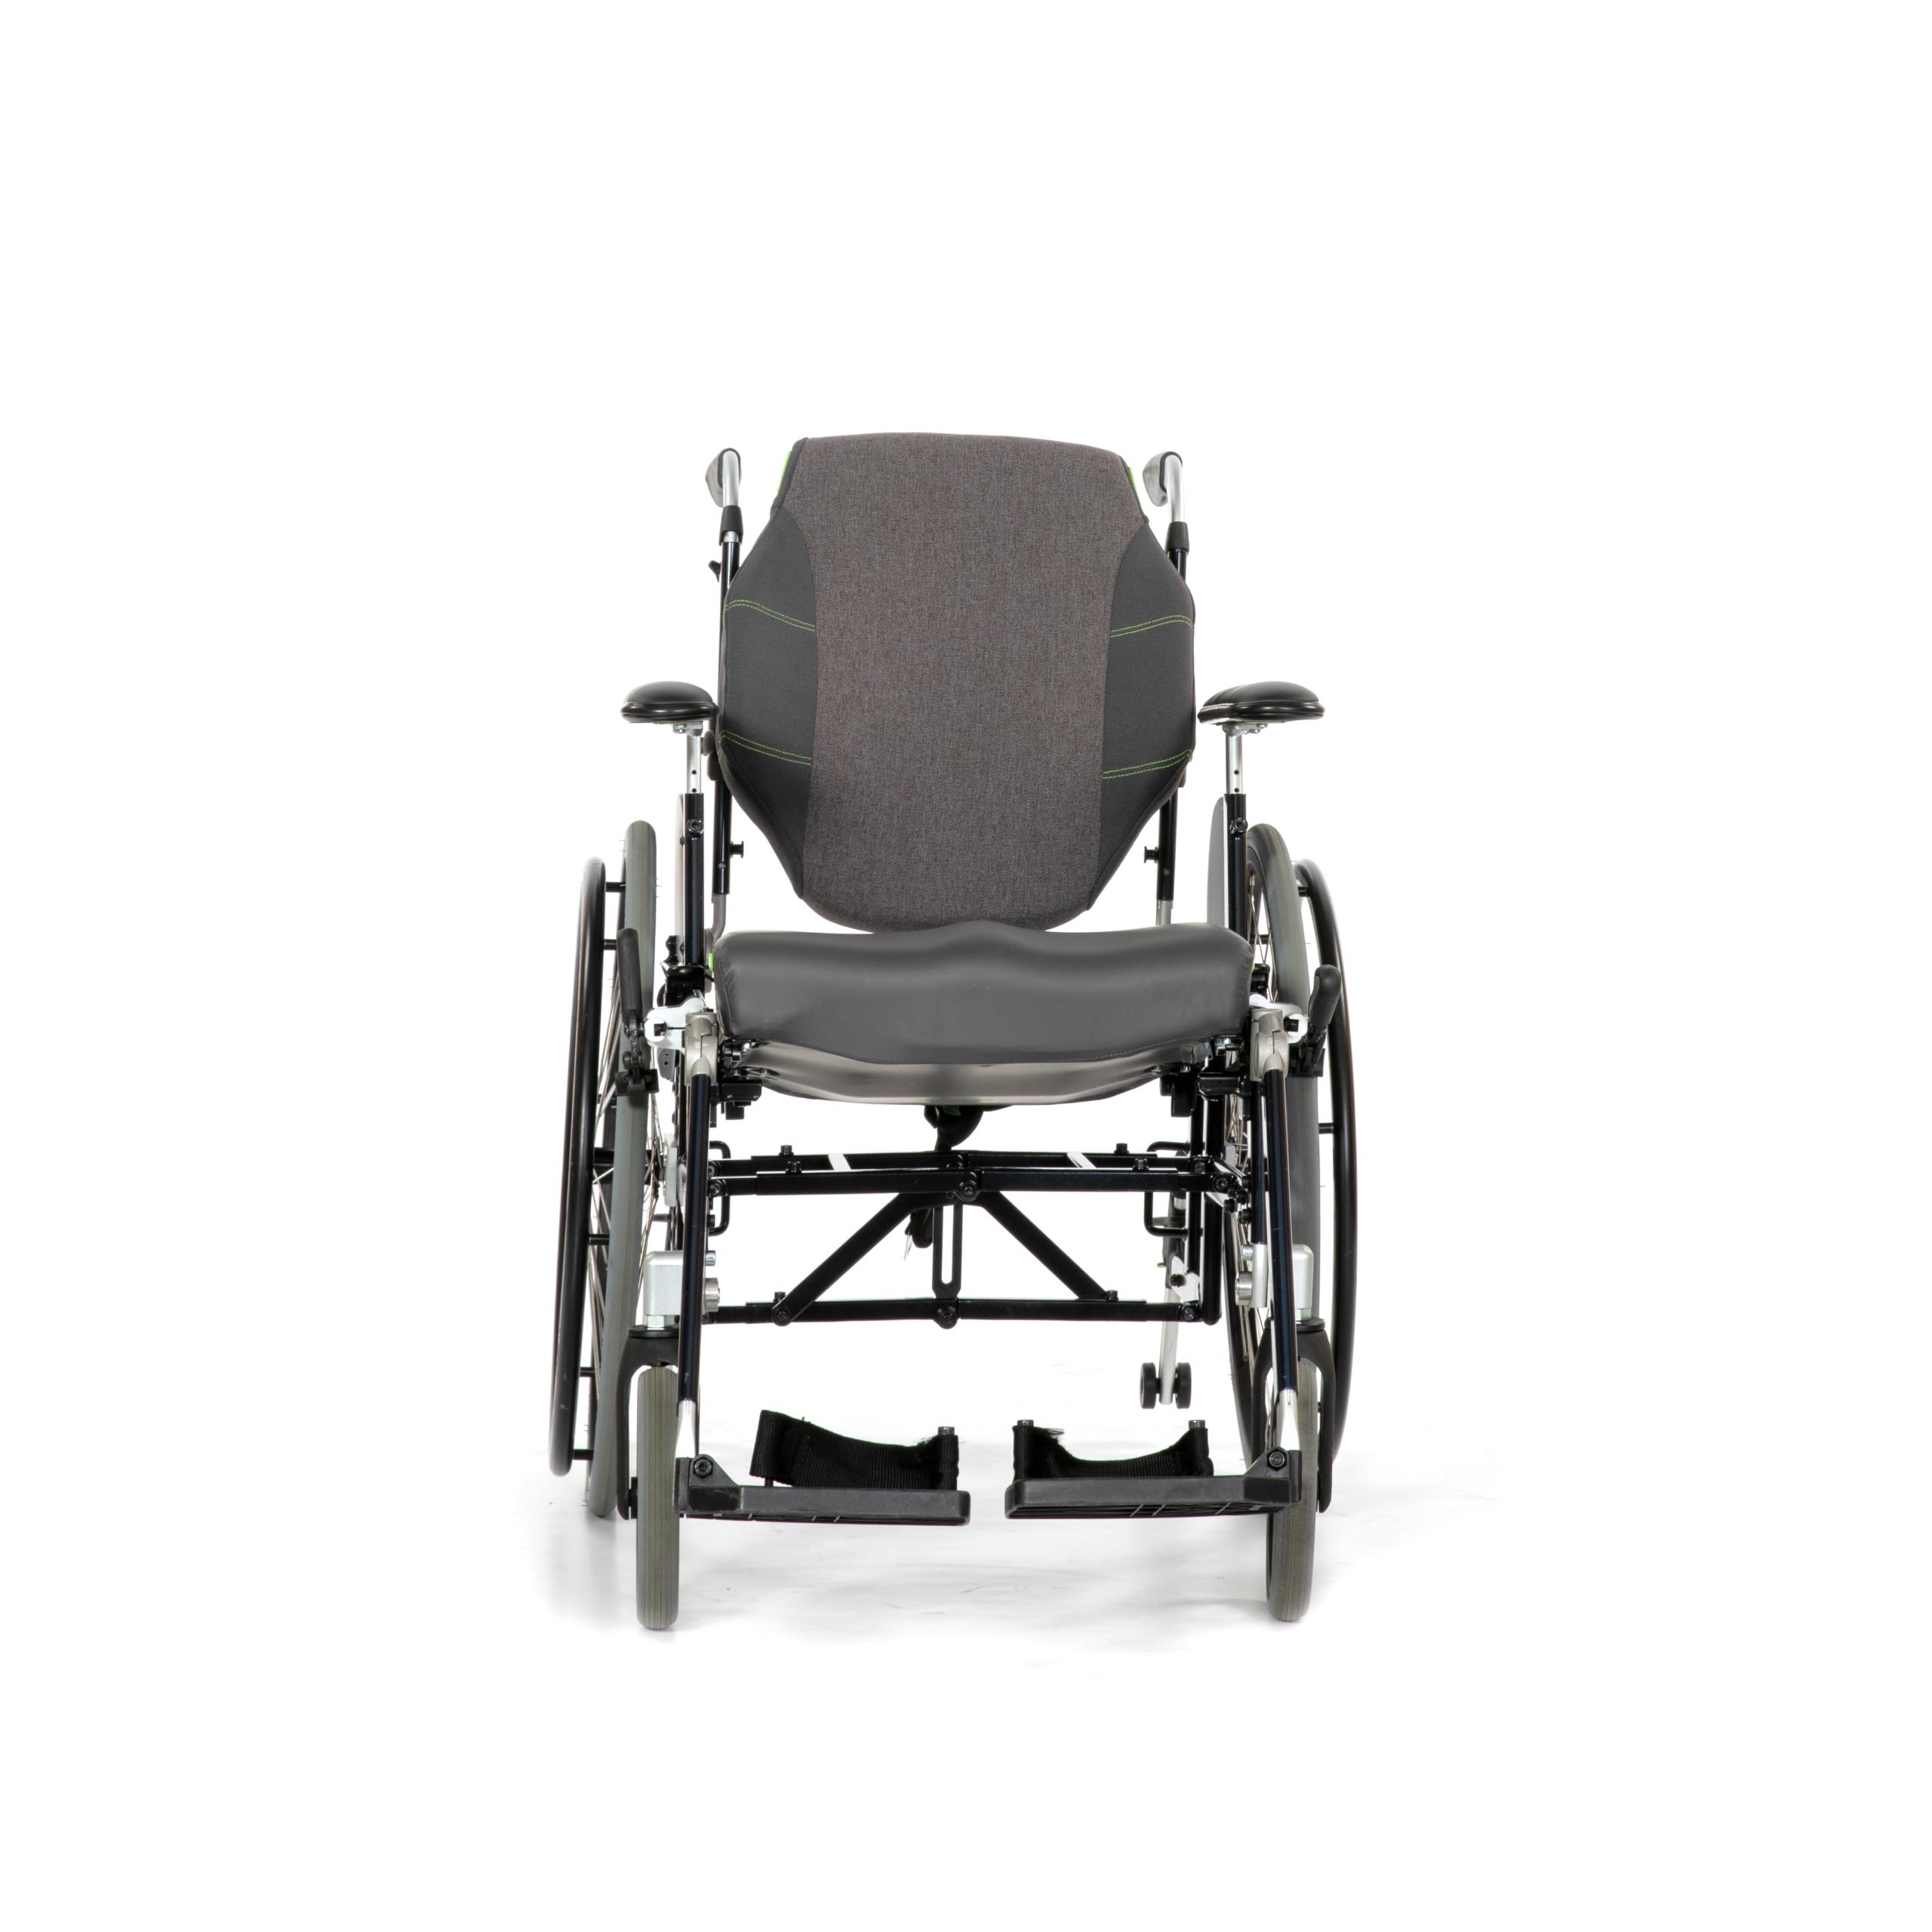 WLZ rolstoel